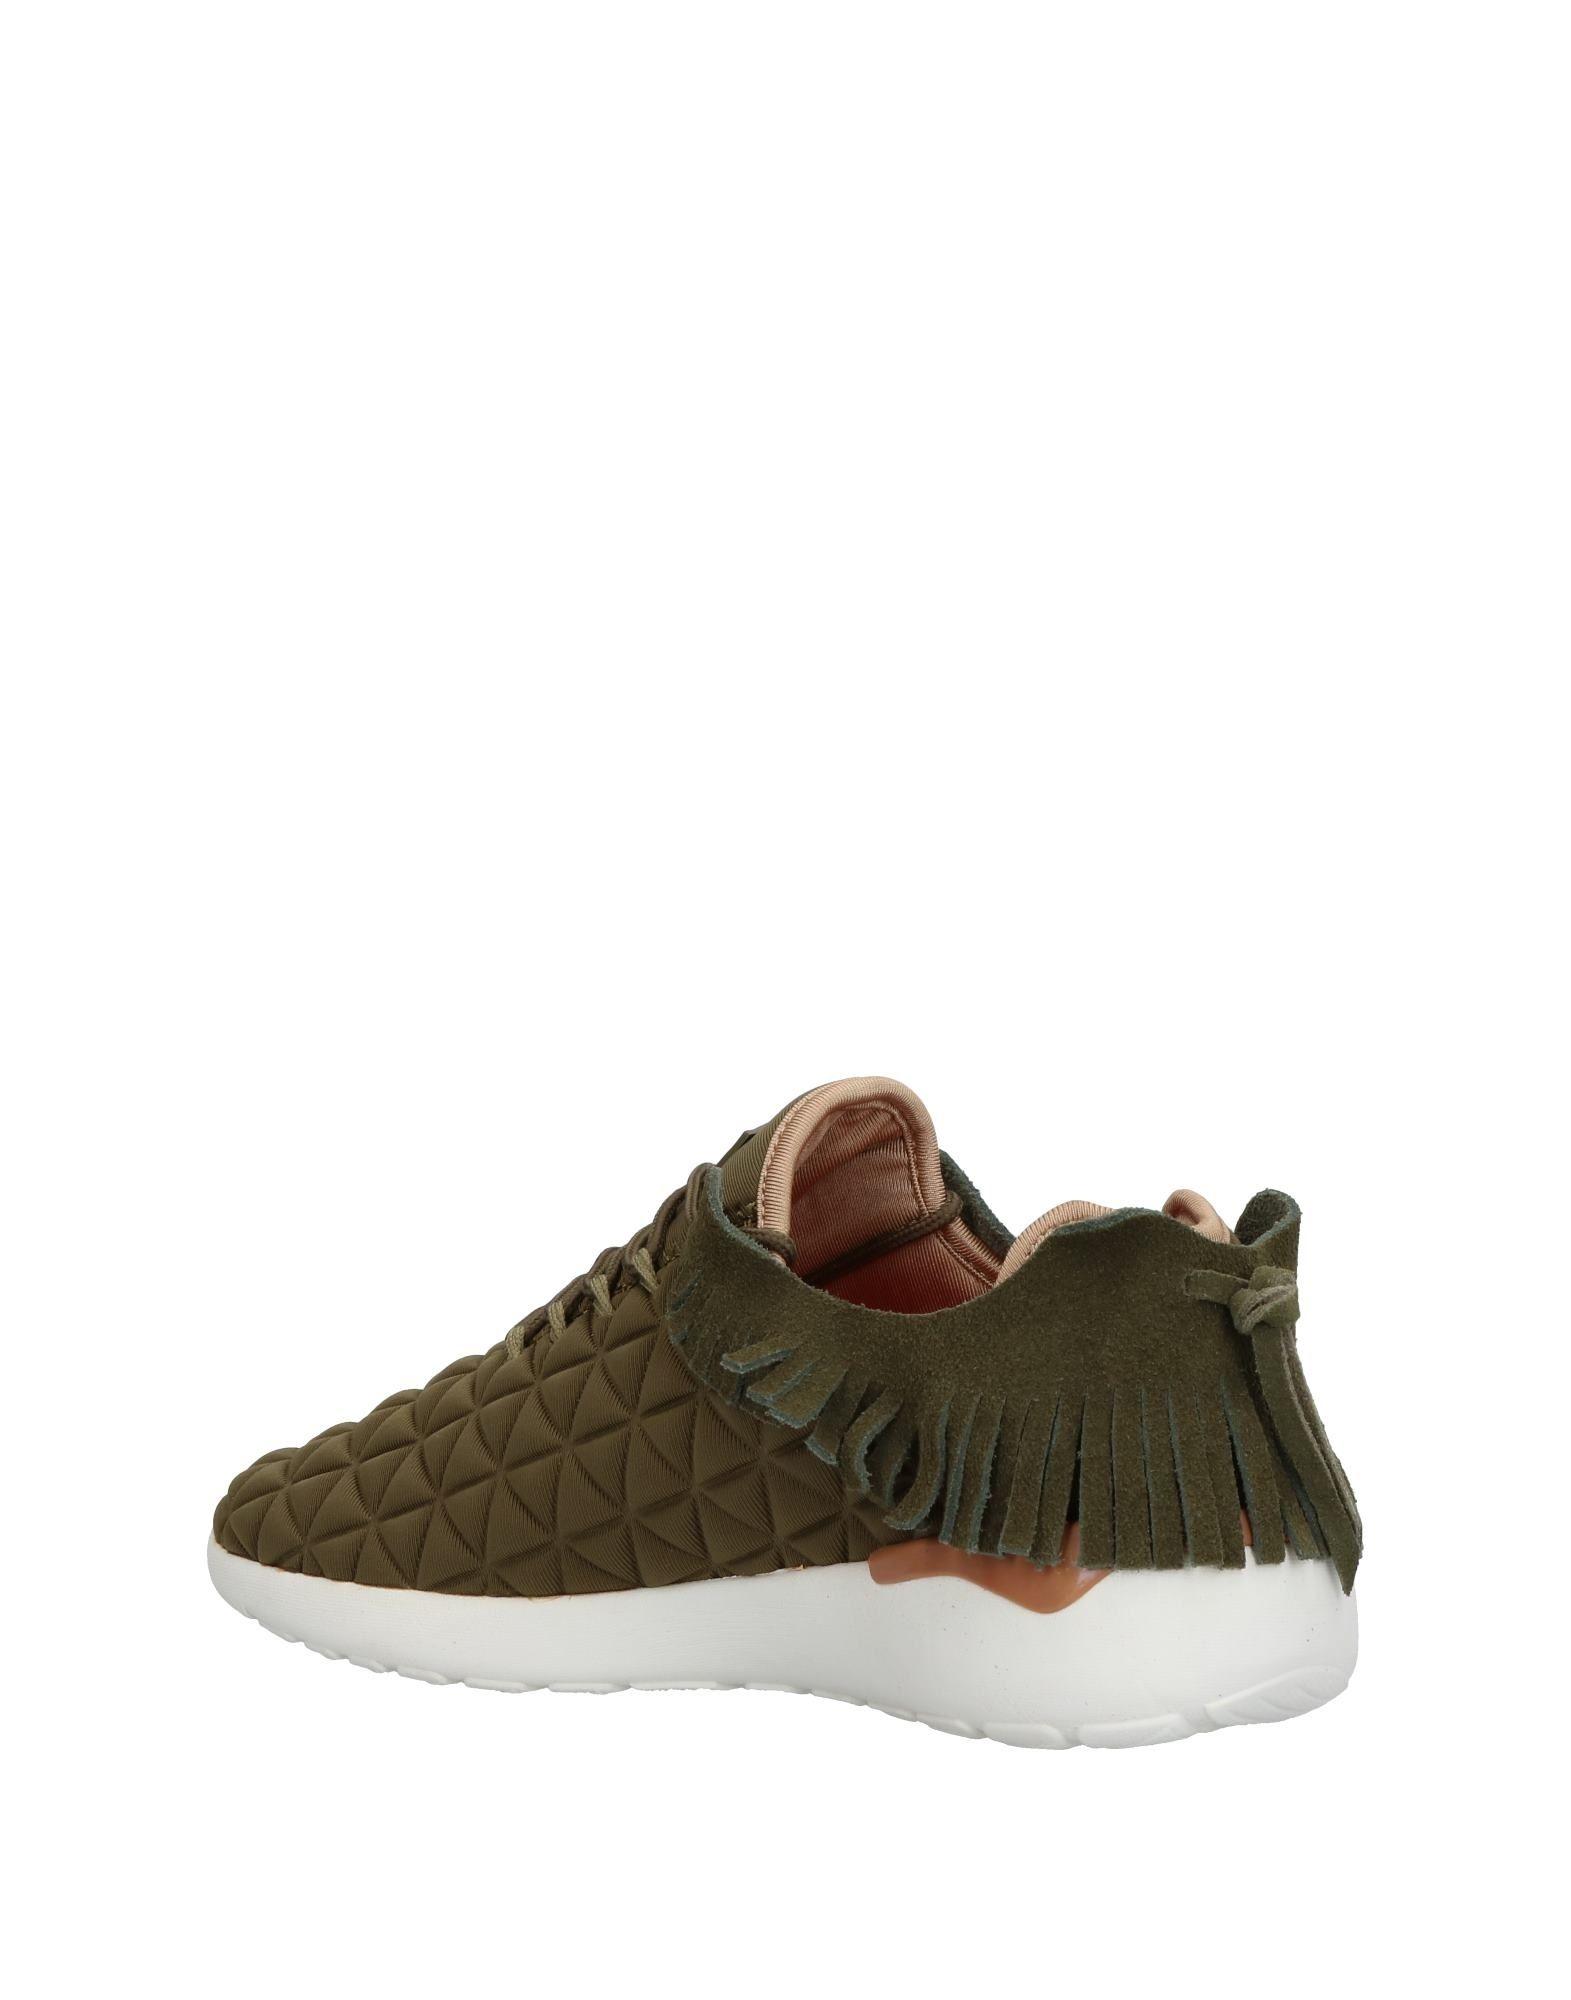 Moda Sneakers Sneakers Moda Asfvlt Donna - 11339917GE a82f61